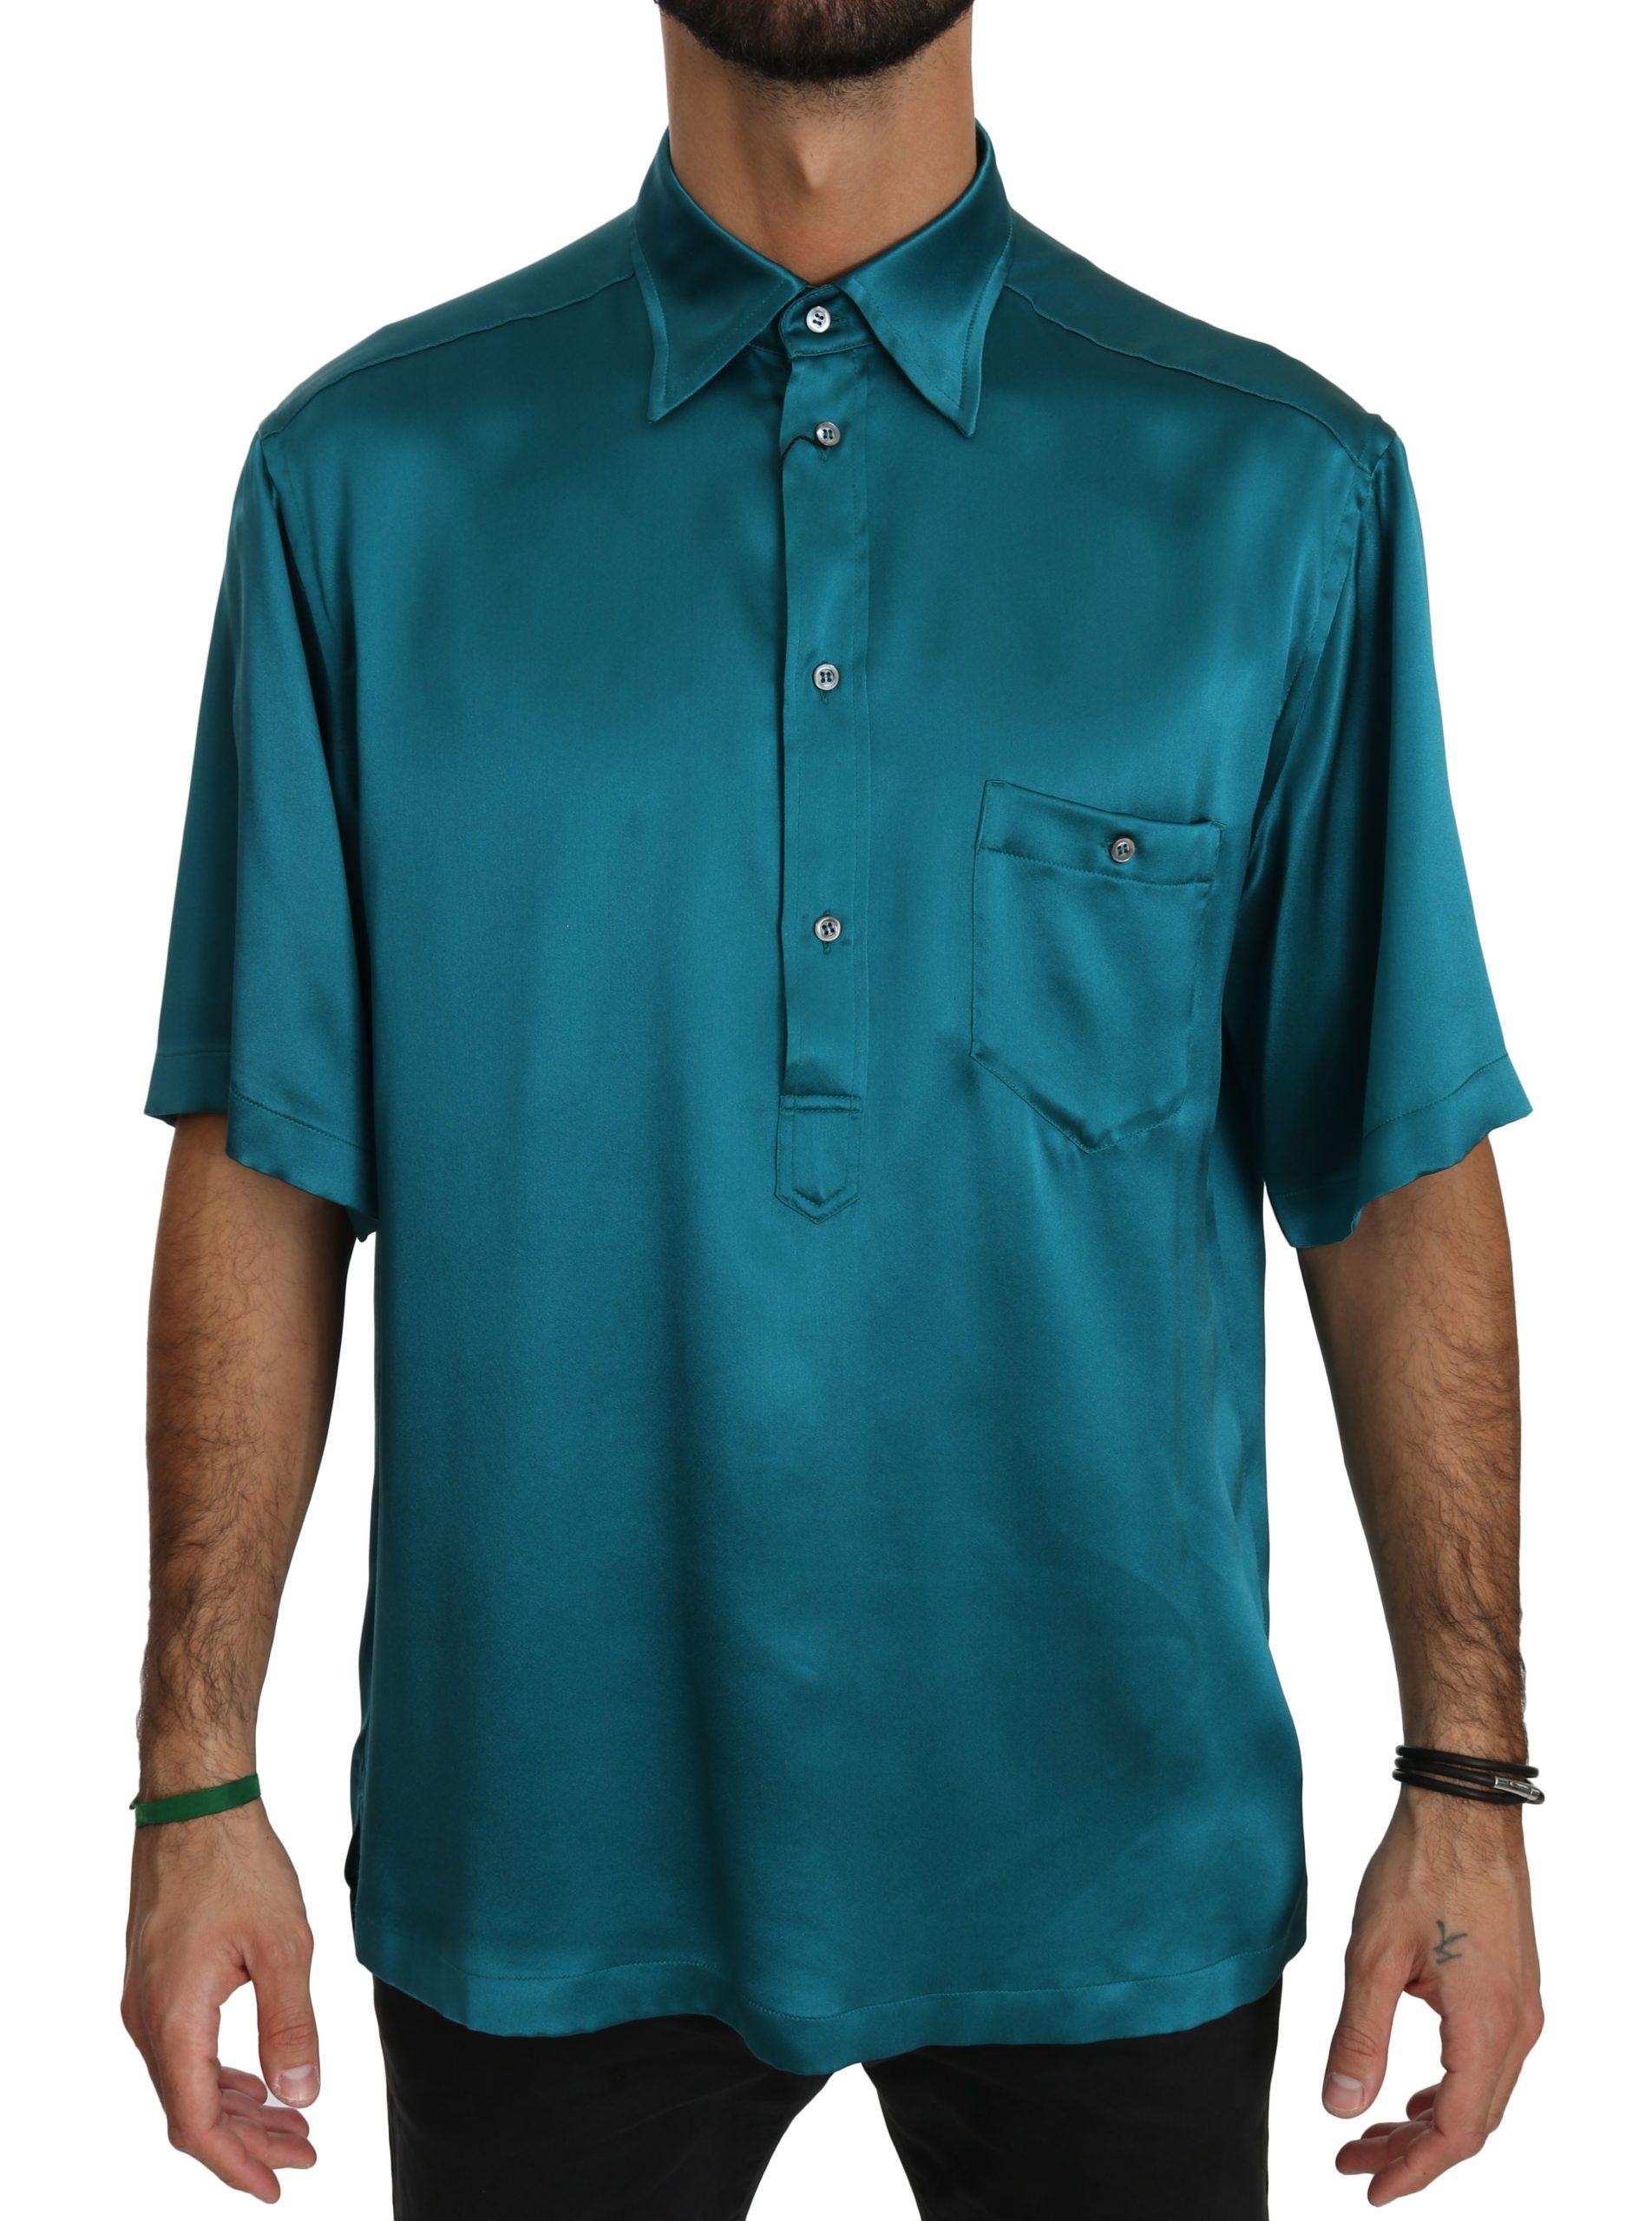 Dolce & Gabbana Men's Short Sleeve 100% Silk Shirt Blue TSH4016 - IT40 | M